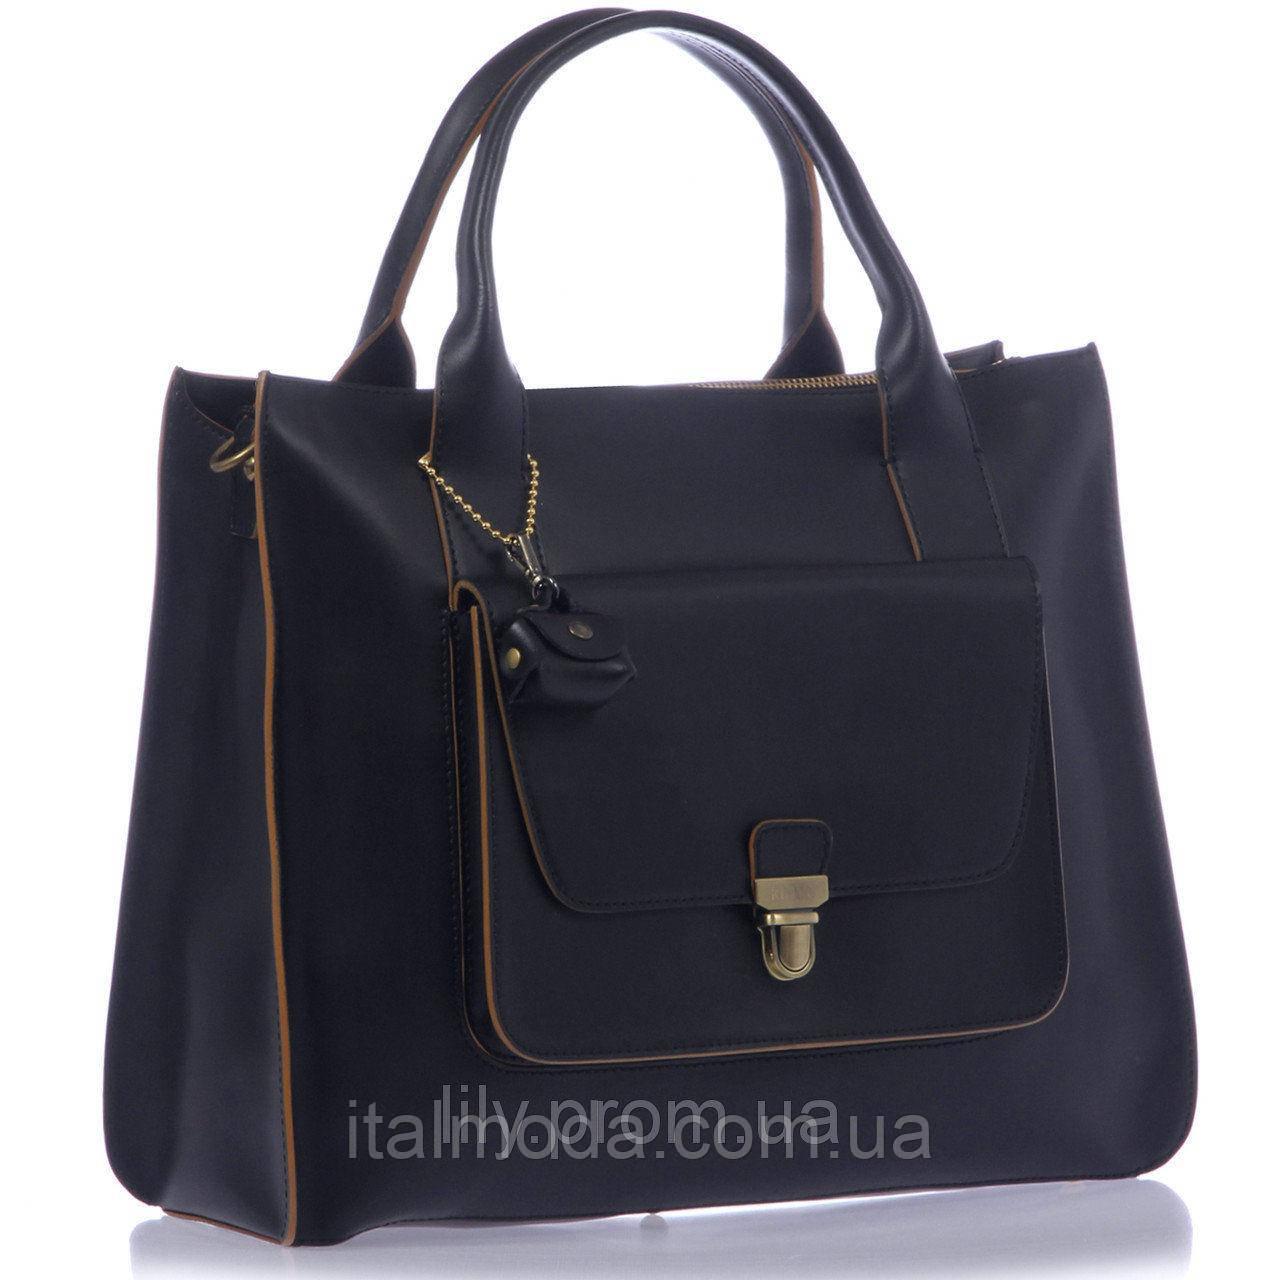 7f9f866fa20a Женская сумка RIPANI Артикул 5735, цена 4 760 грн., купить Київ ...